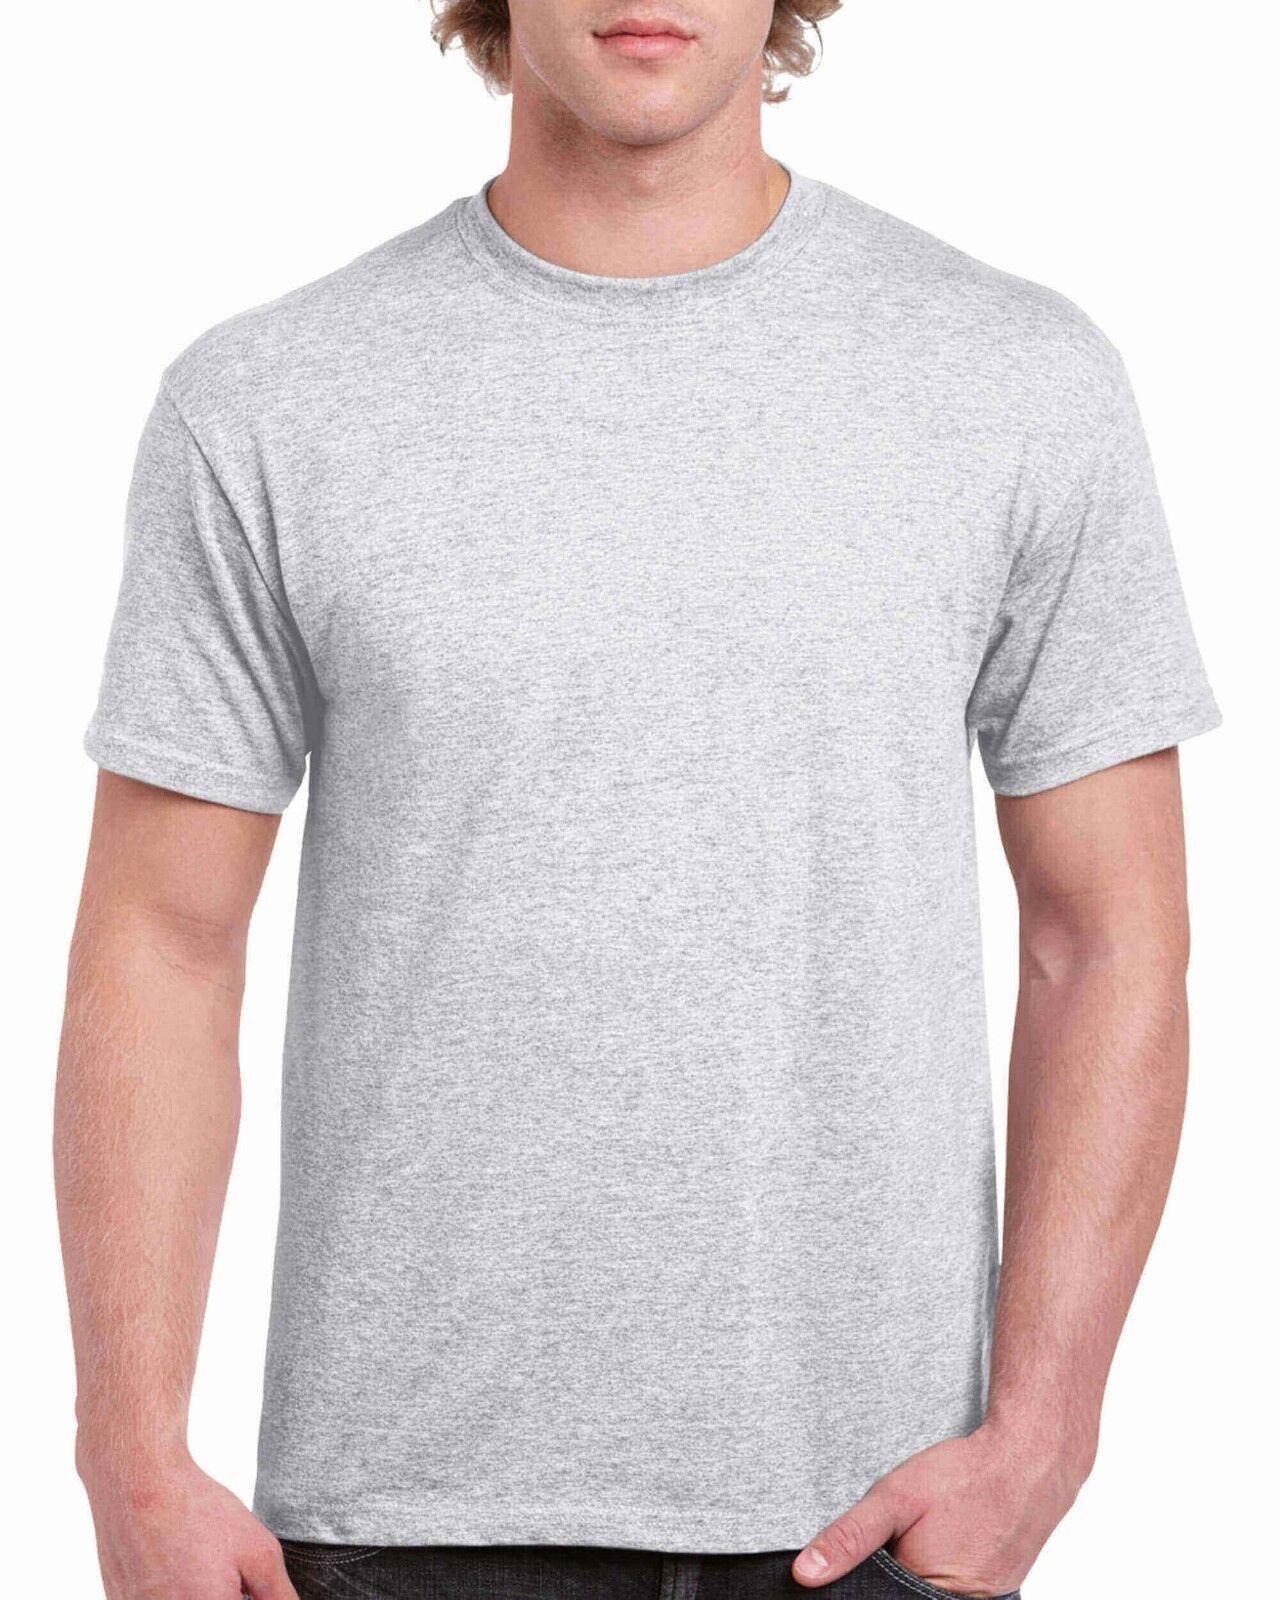 Gildan 2000 Adult Blank T Shirt